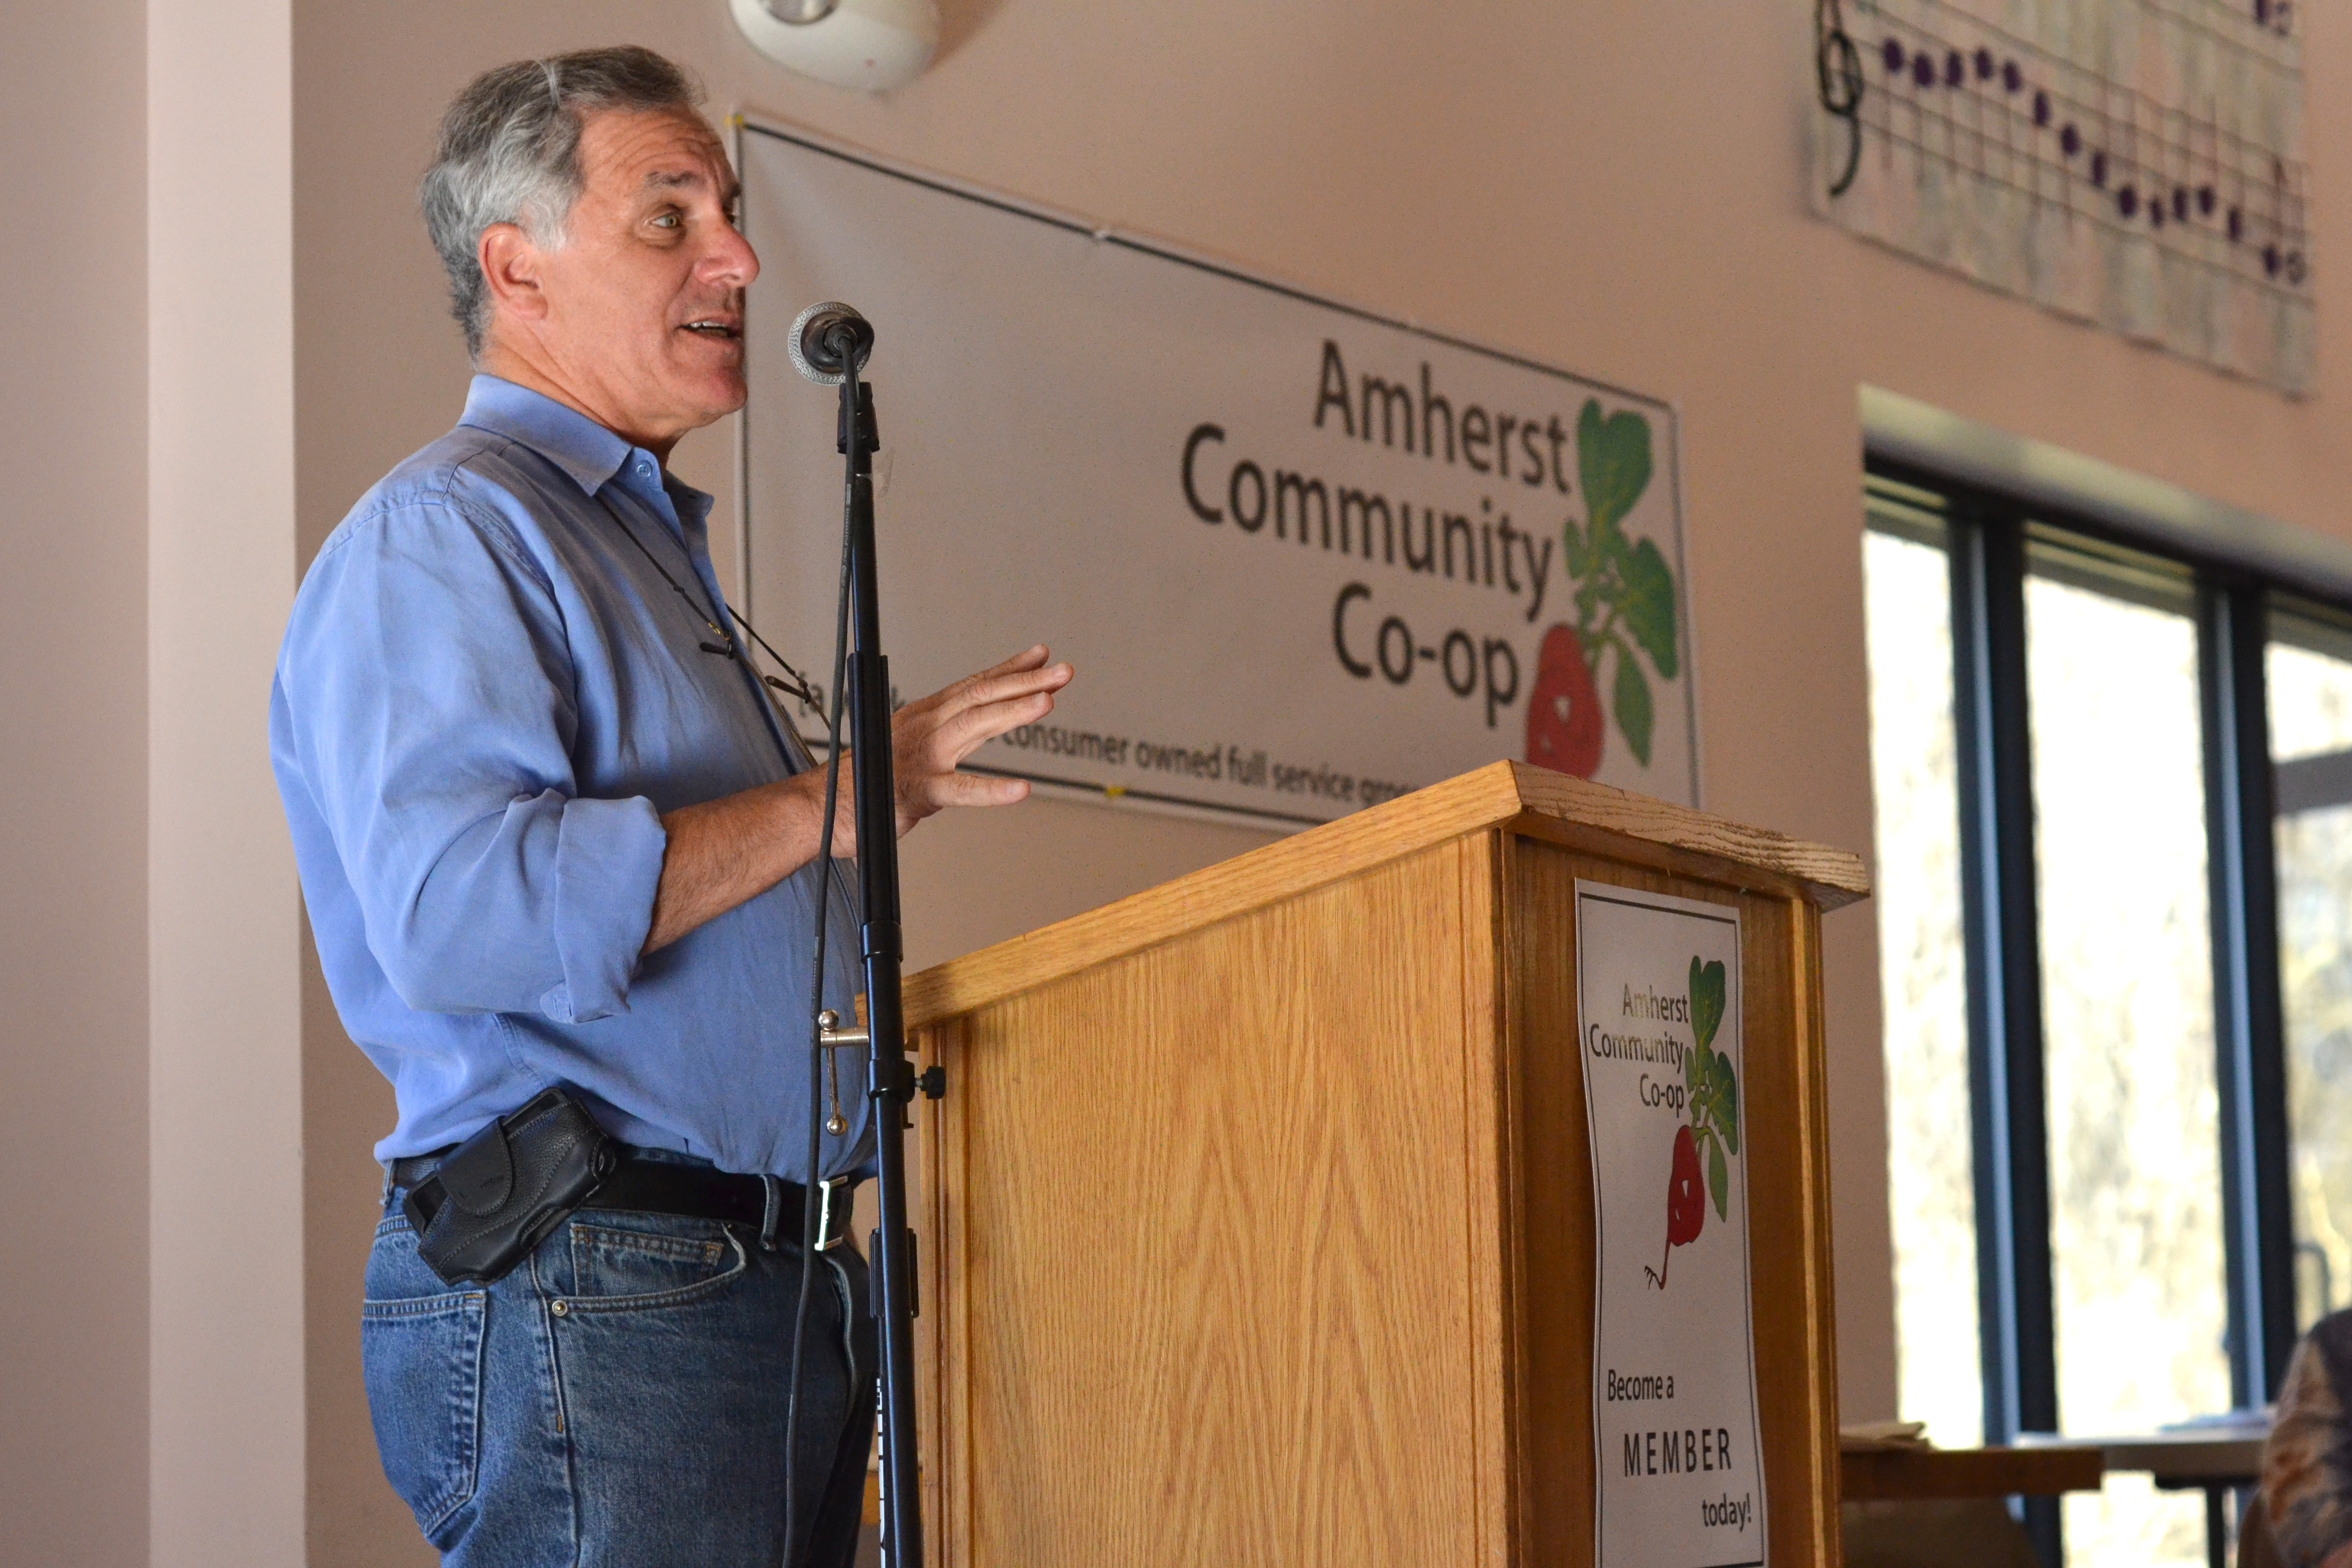 Gary Hirshberg of Stonyfield Farms speaks. [photo credit: Rebekah Hanlon]